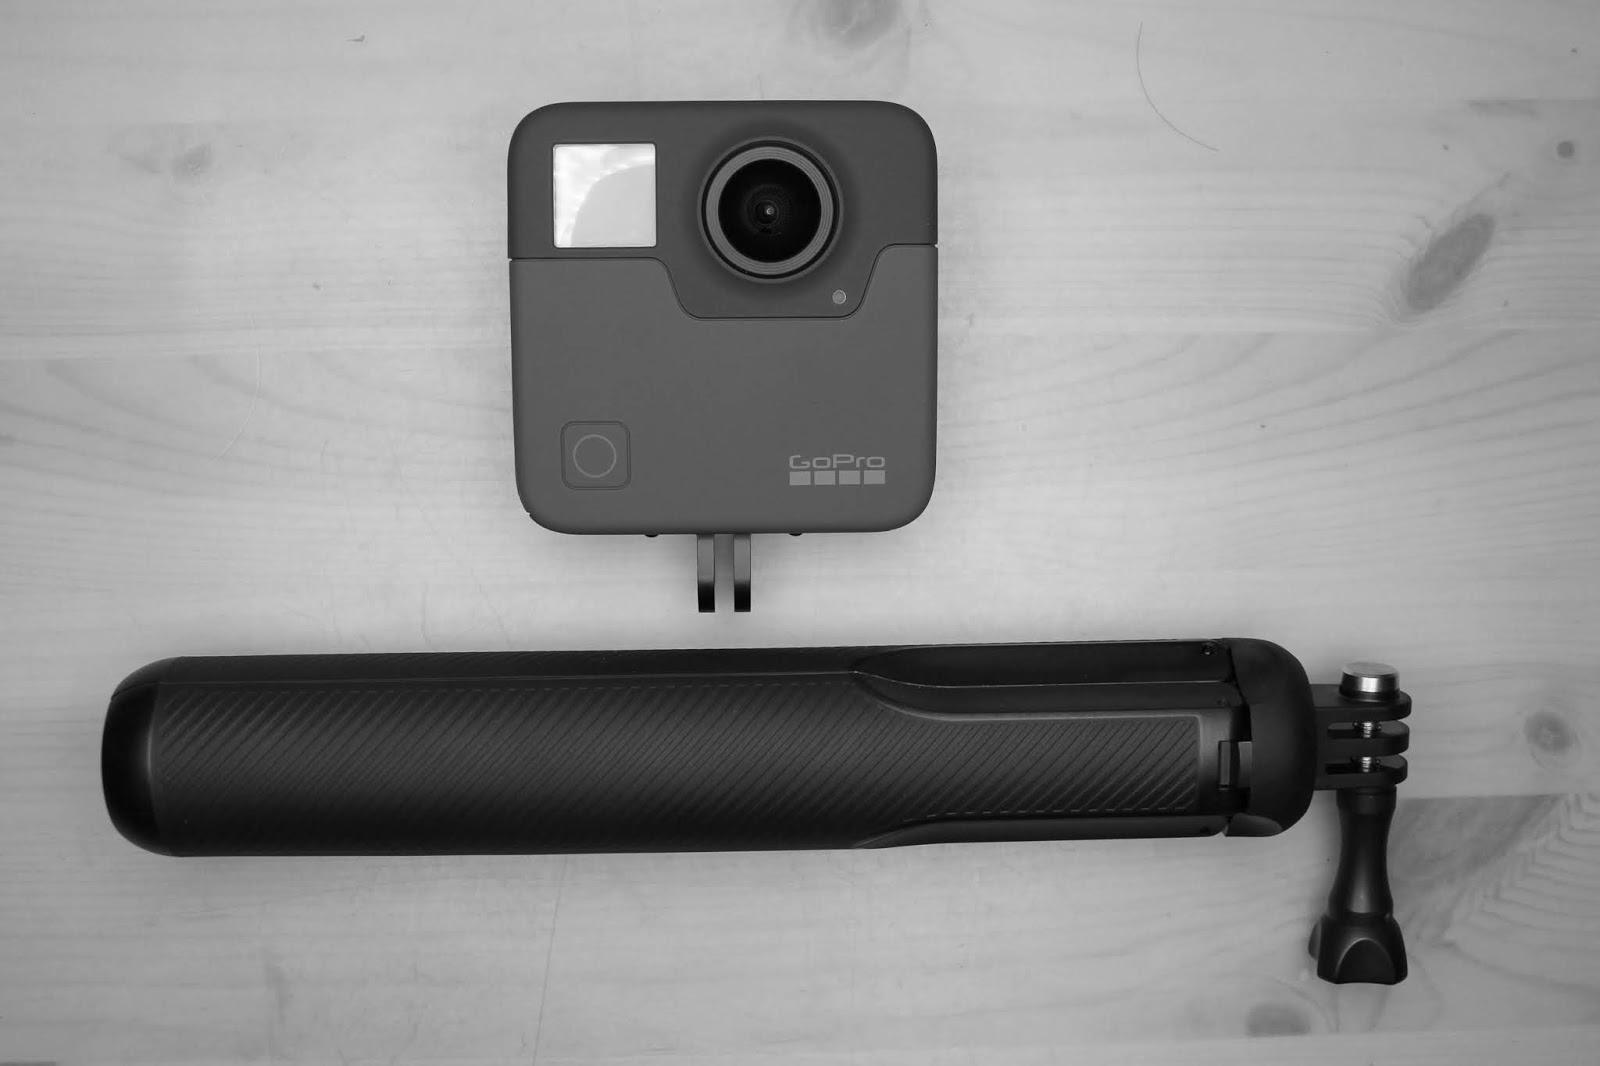 Gear Rental : Sewa Kamera: GoPro Fusion 360 on